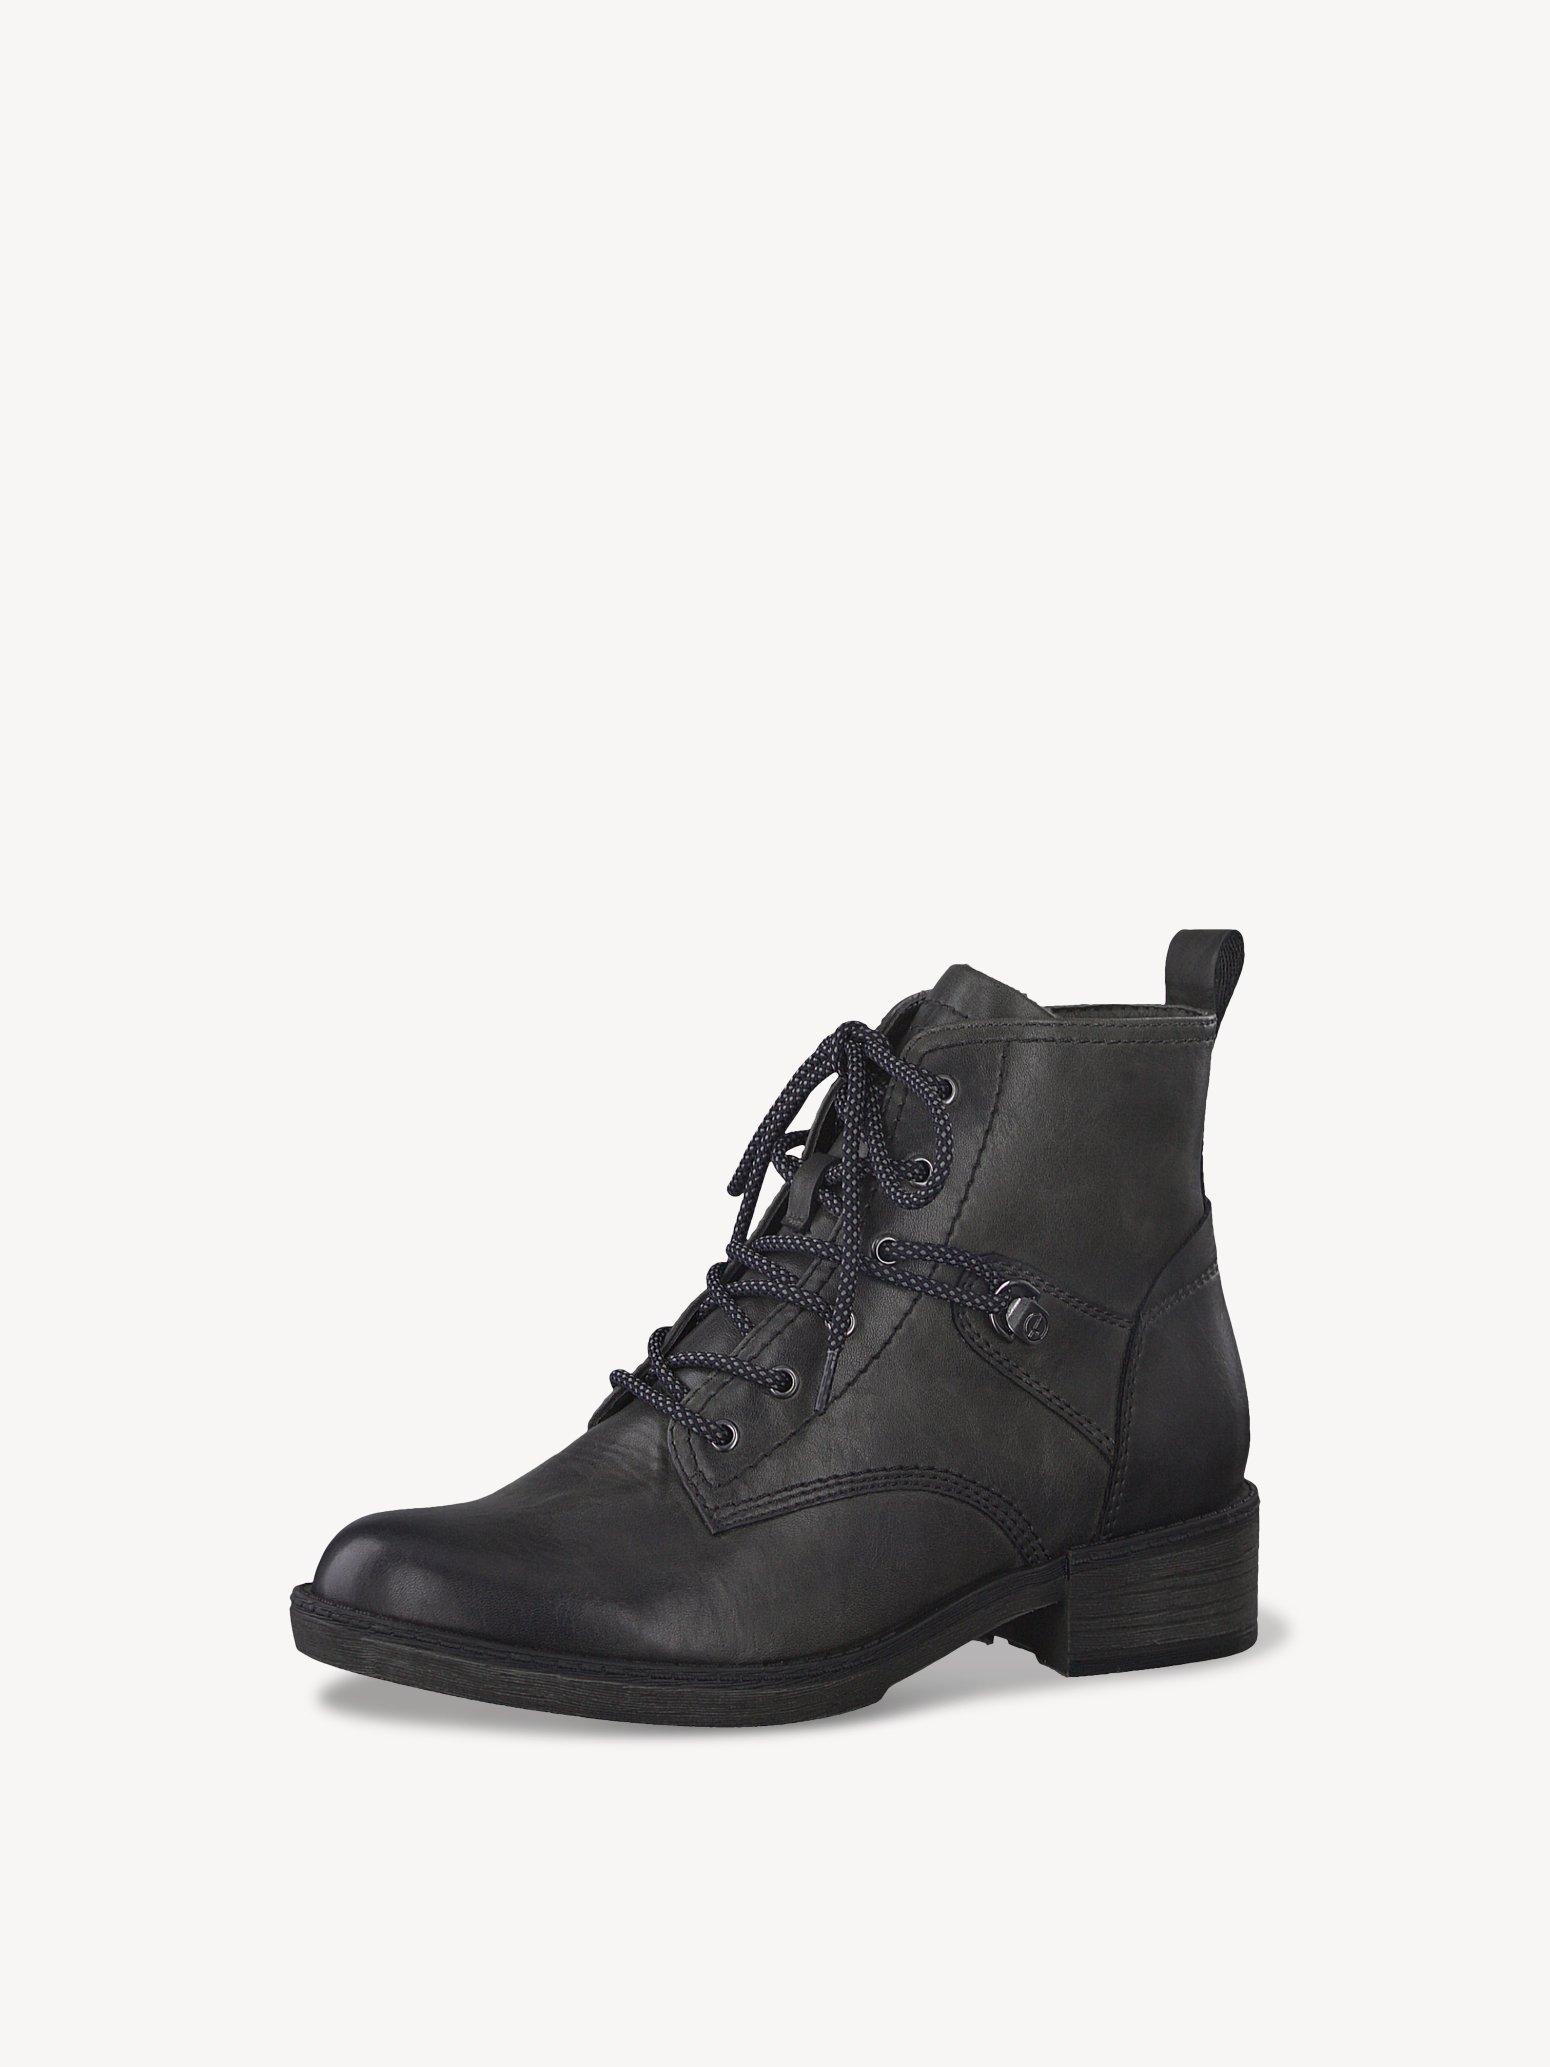 Ботинки Tamaris 1-1-25116-25-969